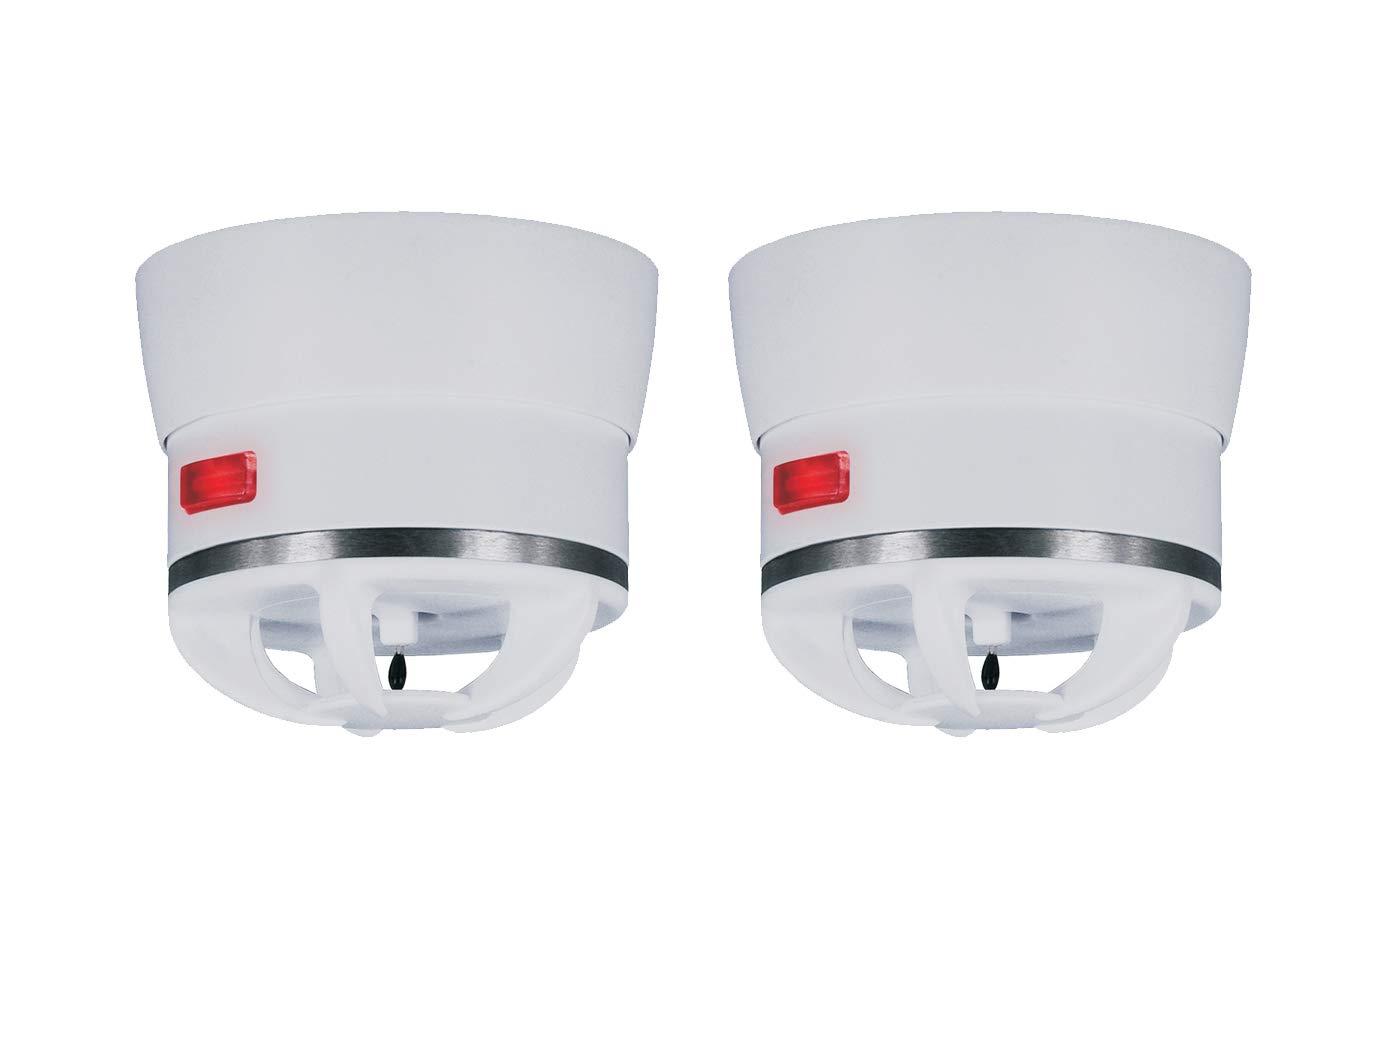 2er Set Extra kleiner Mini Hitzemelder CAVIUS, 85dB-Signal, optimal fü r Kü che oder Badezimmer, 3002-003-2 ELRO